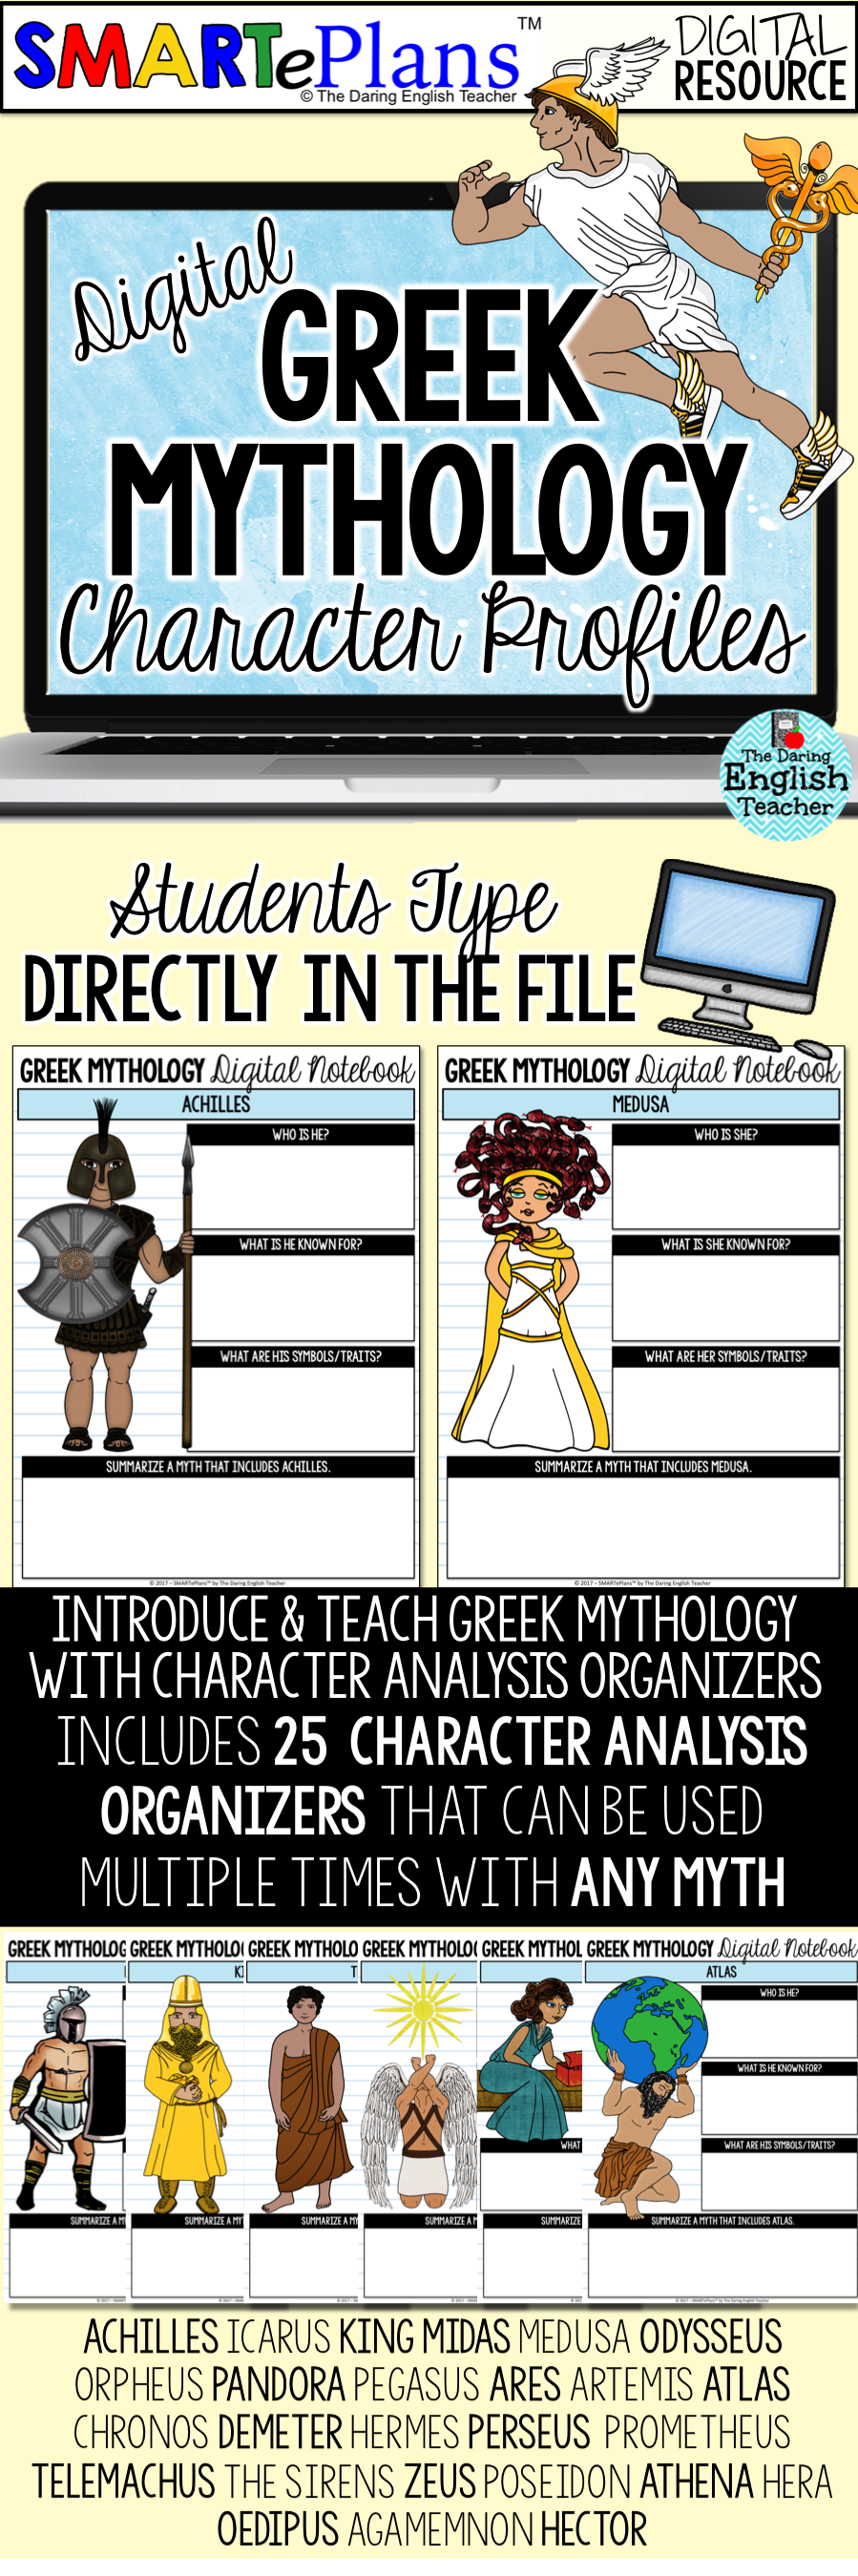 SMARTePlans Digital Greek Mythology Character Analysis Graphic Organizers